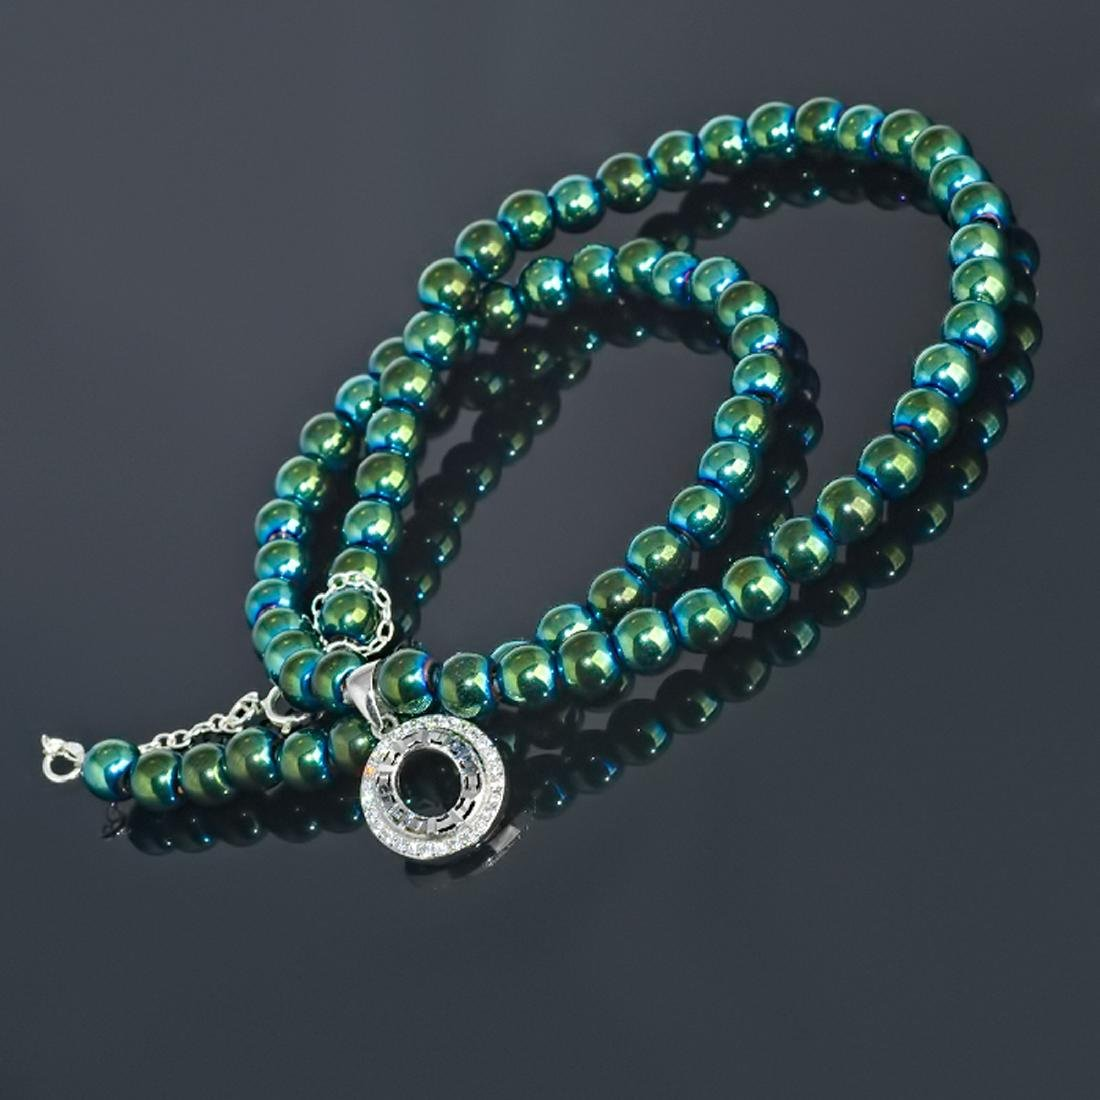 Sterling Silver Green Mirror Hematite Zirconia Necklace - 3